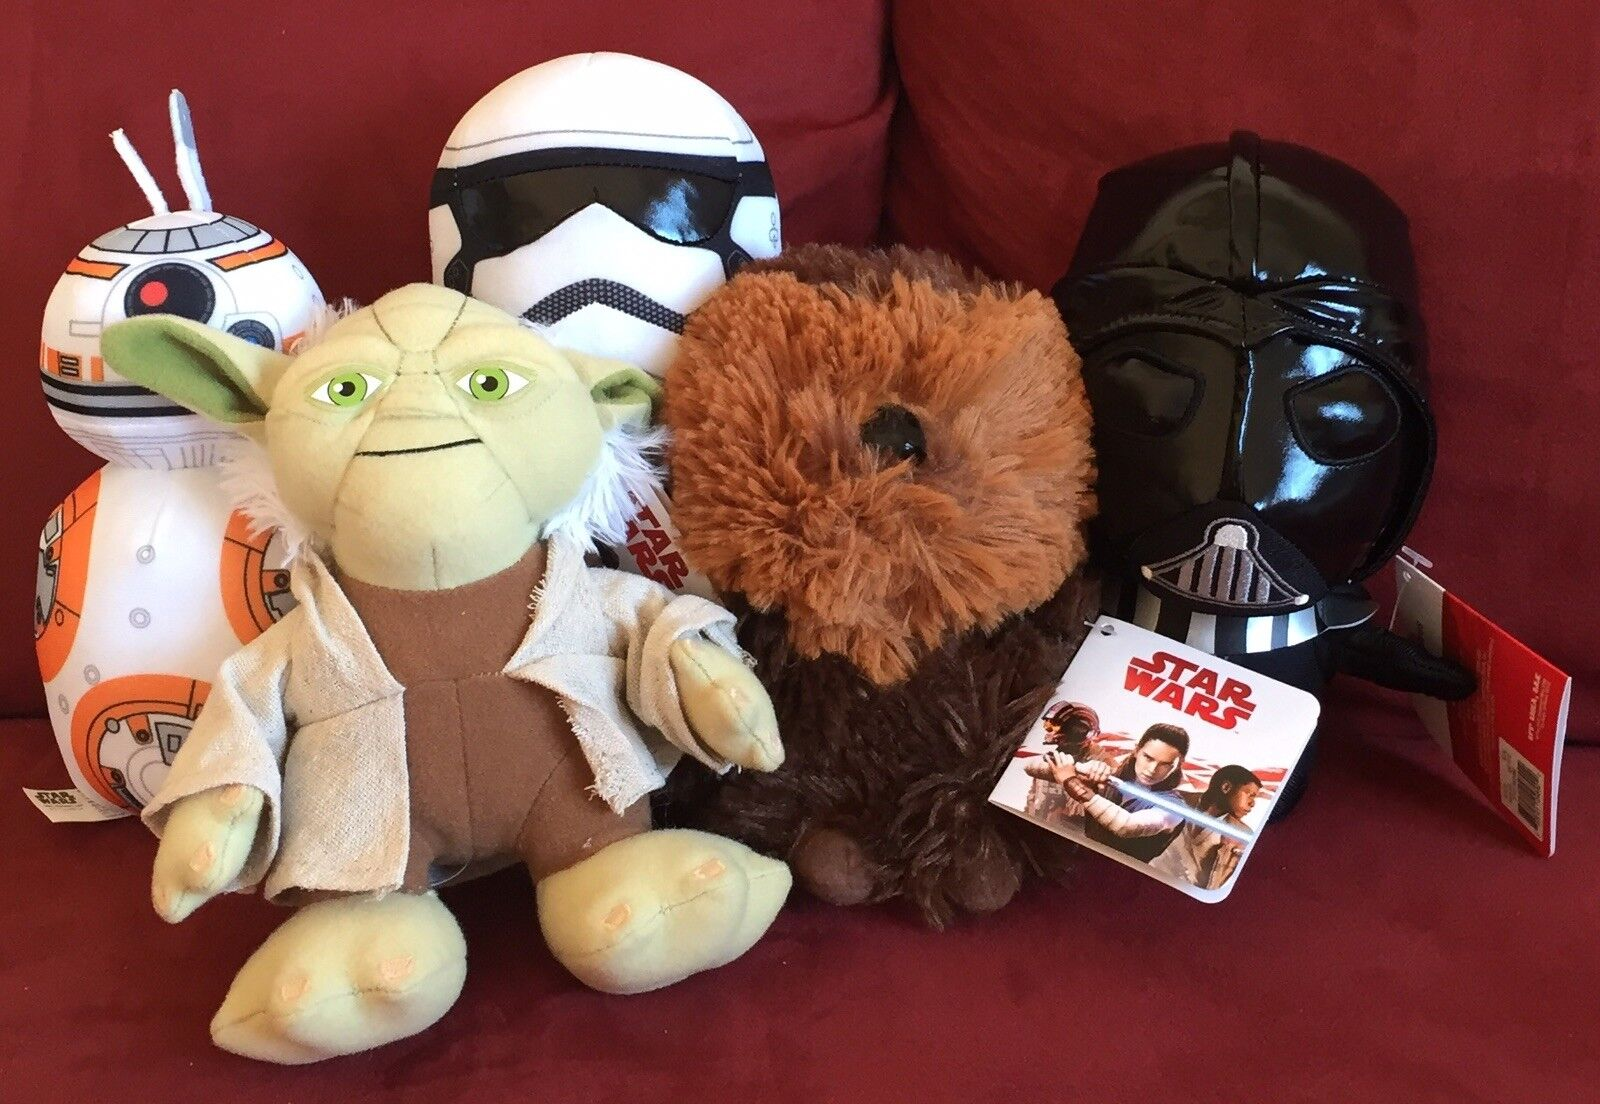 Kohls Cares Kohl's Lot Star Wars Yoda Chewbacca Storm Trooper BB8 R2D2 New Tags